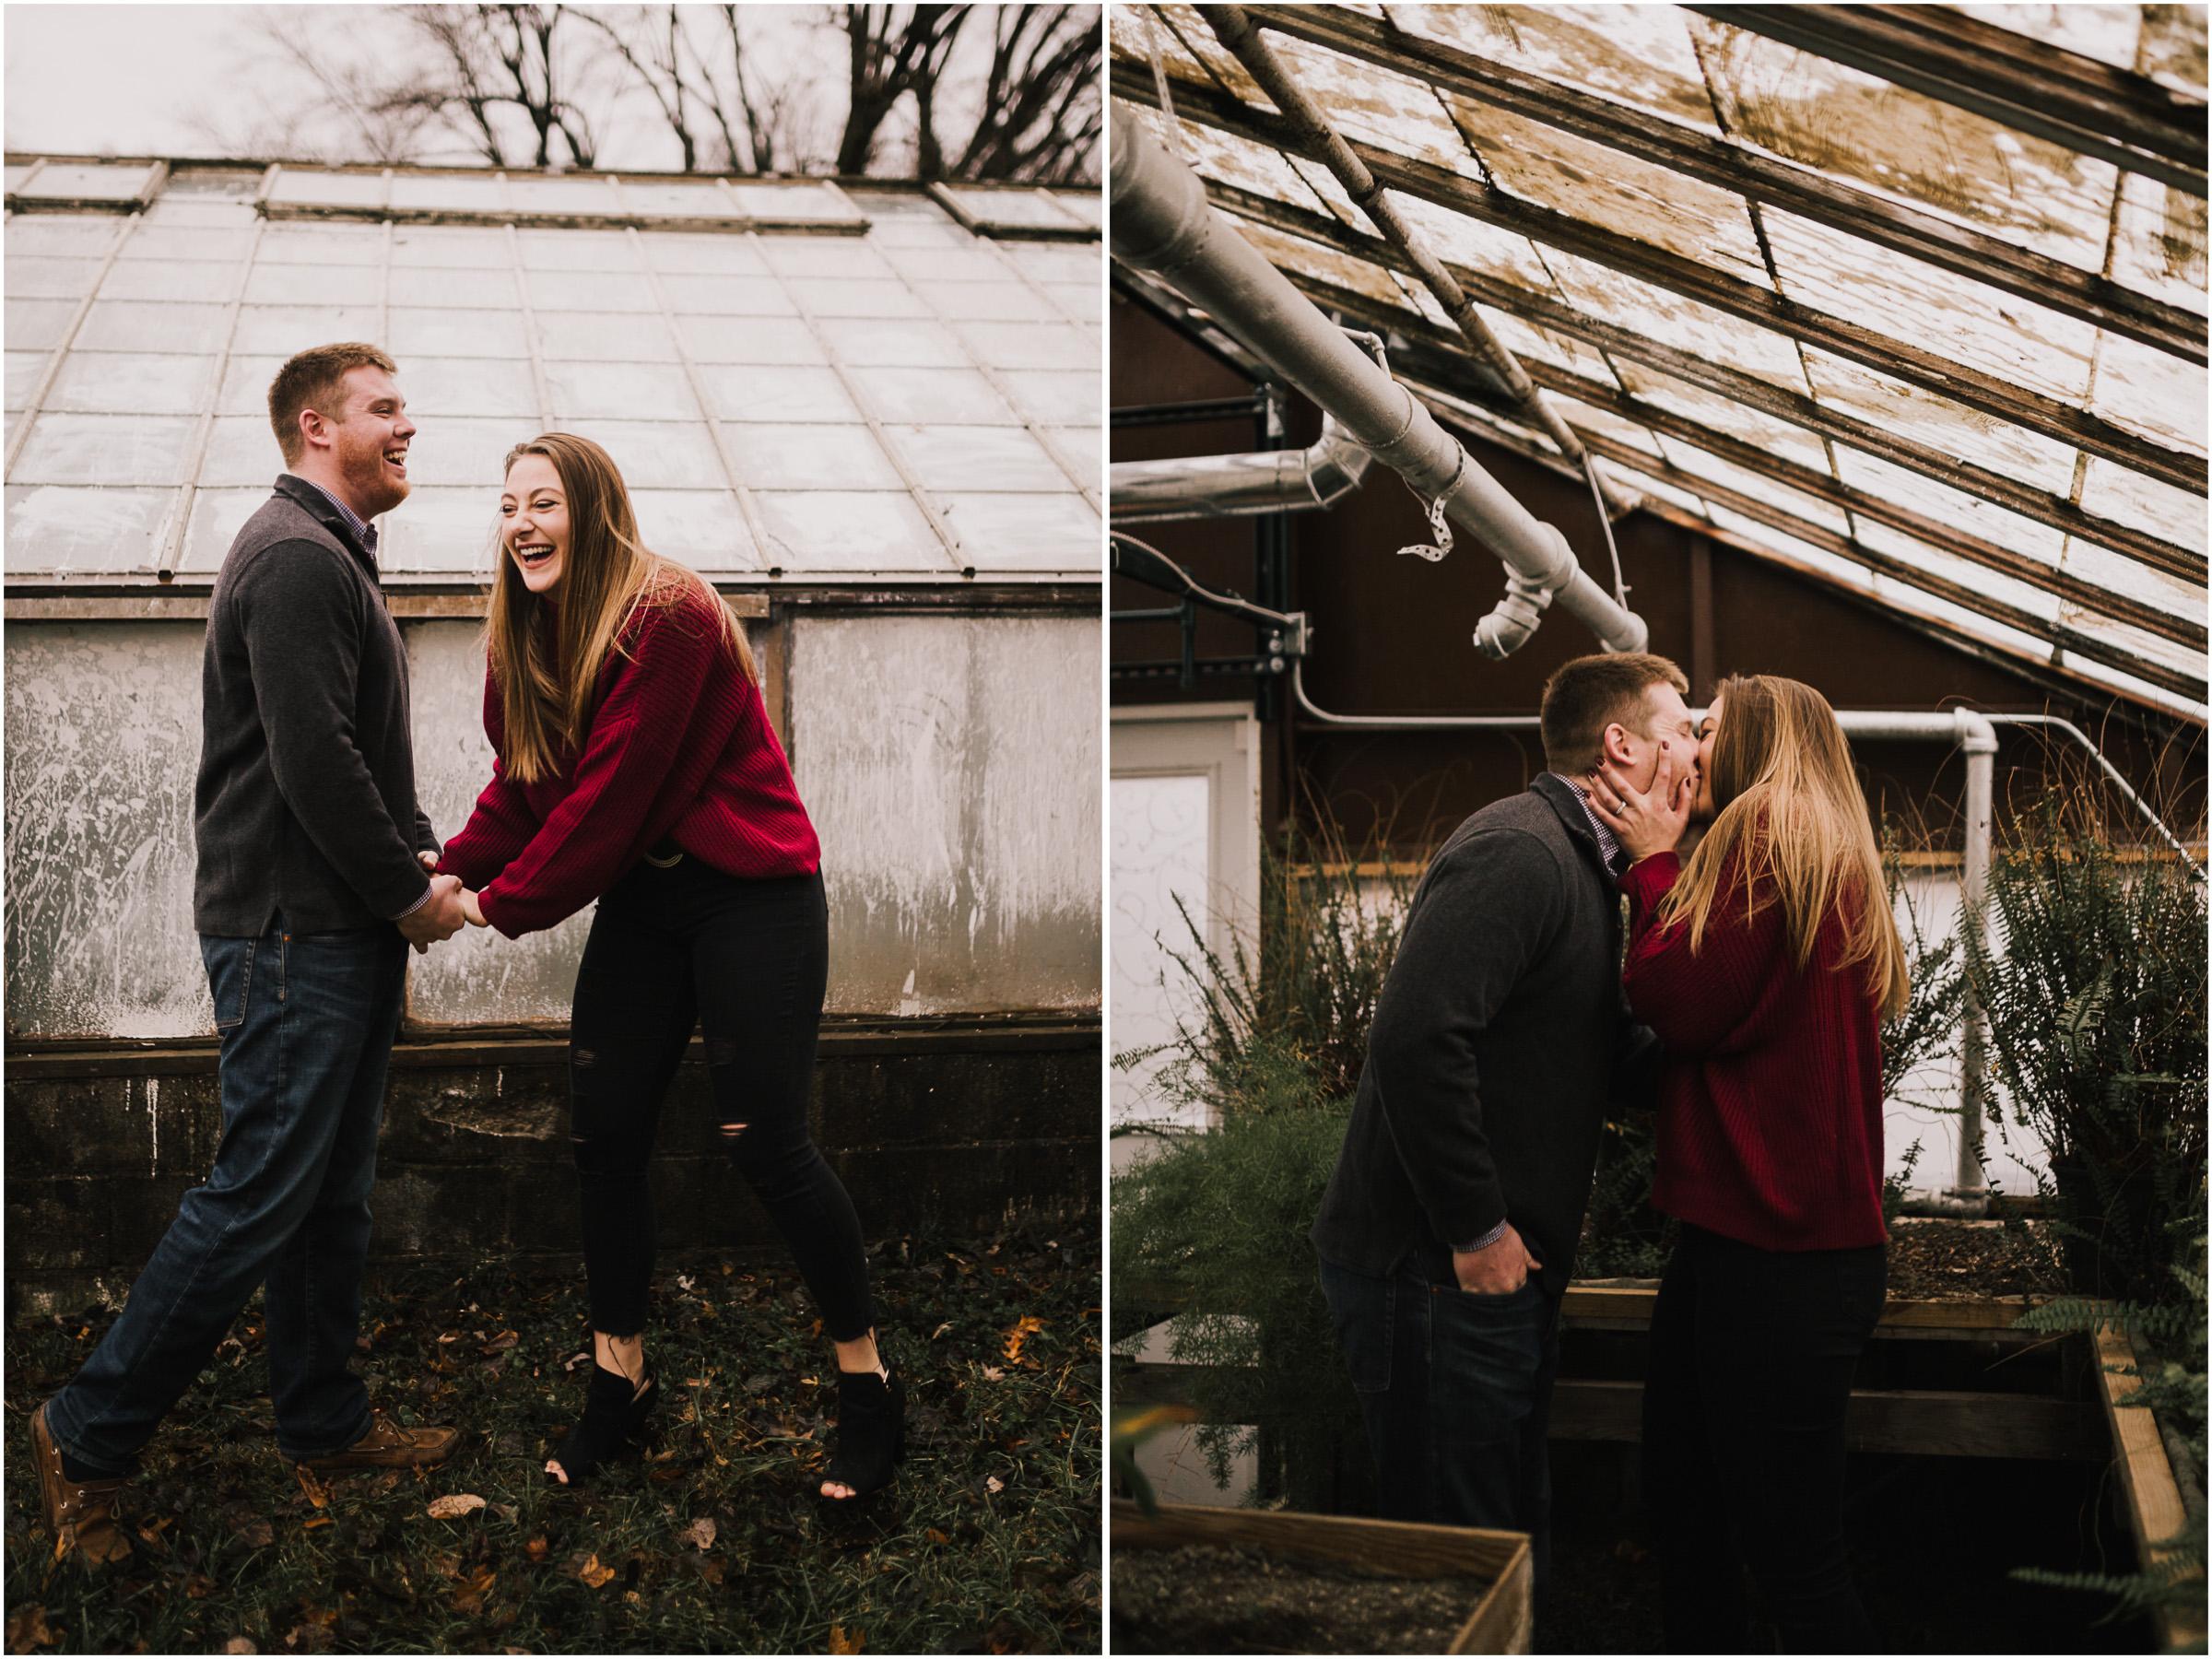 alyssa barletter photography johns greenhouse kansas city missouri brookside waldo engagement session winter-8.jpg